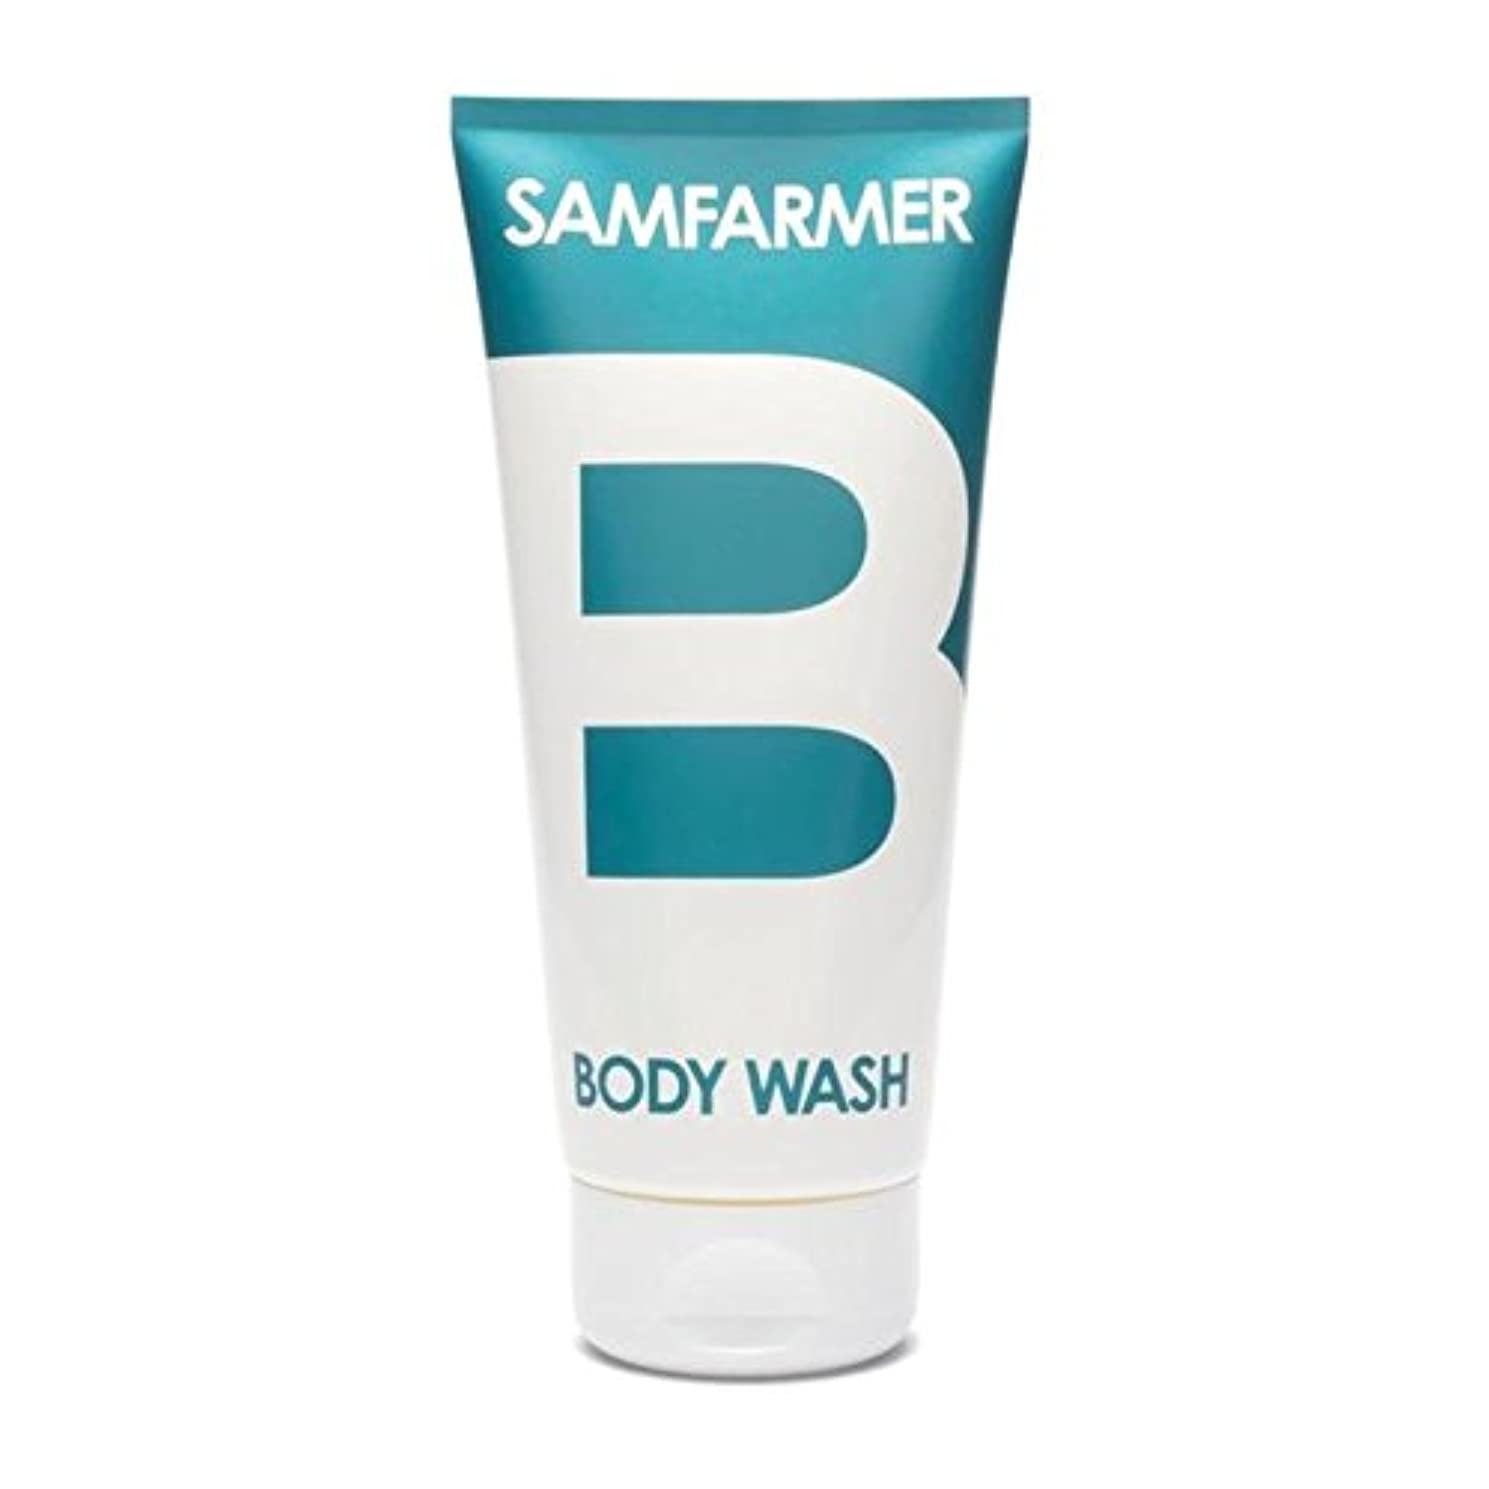 SAMFARMER Unisex Body Wash 200ml - ユニセックスボディウォッシュ200ミリリットル [並行輸入品]